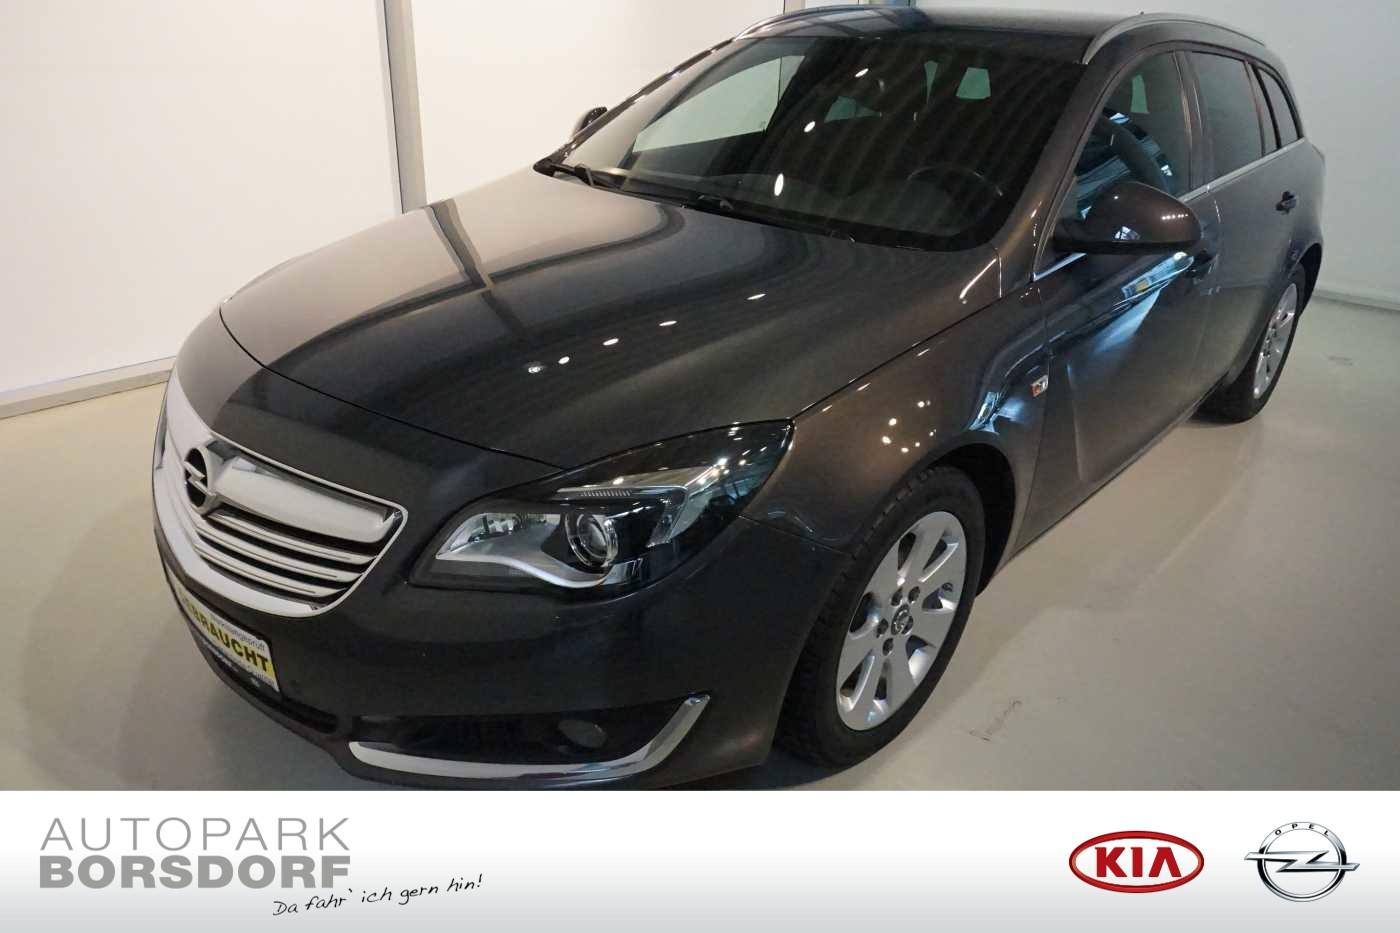 Opel Insignia 2.0 CDTI Sport Xenon Navi, Jahr 2014, diesel